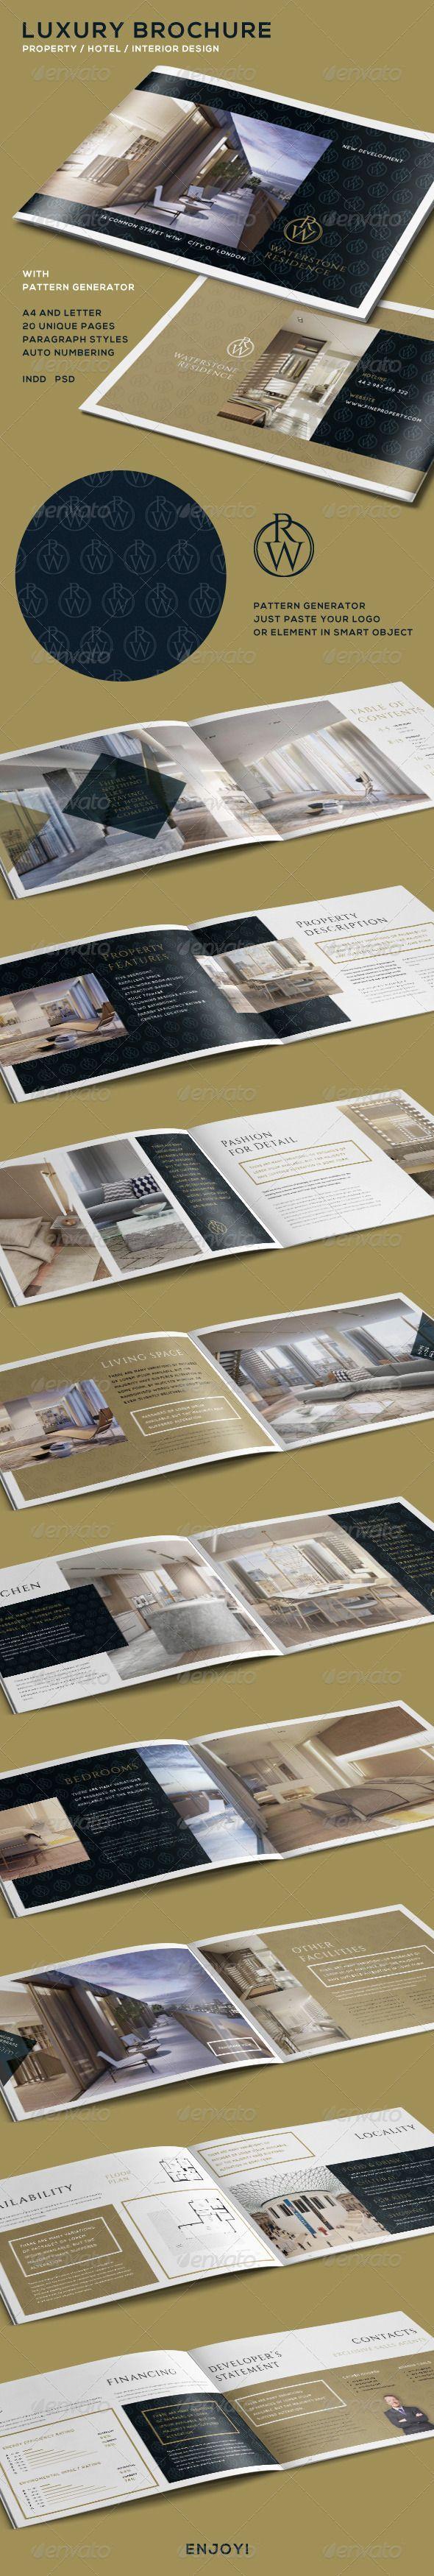 Luxury Brochure for Property - Hotel - Interior | Katalog ...